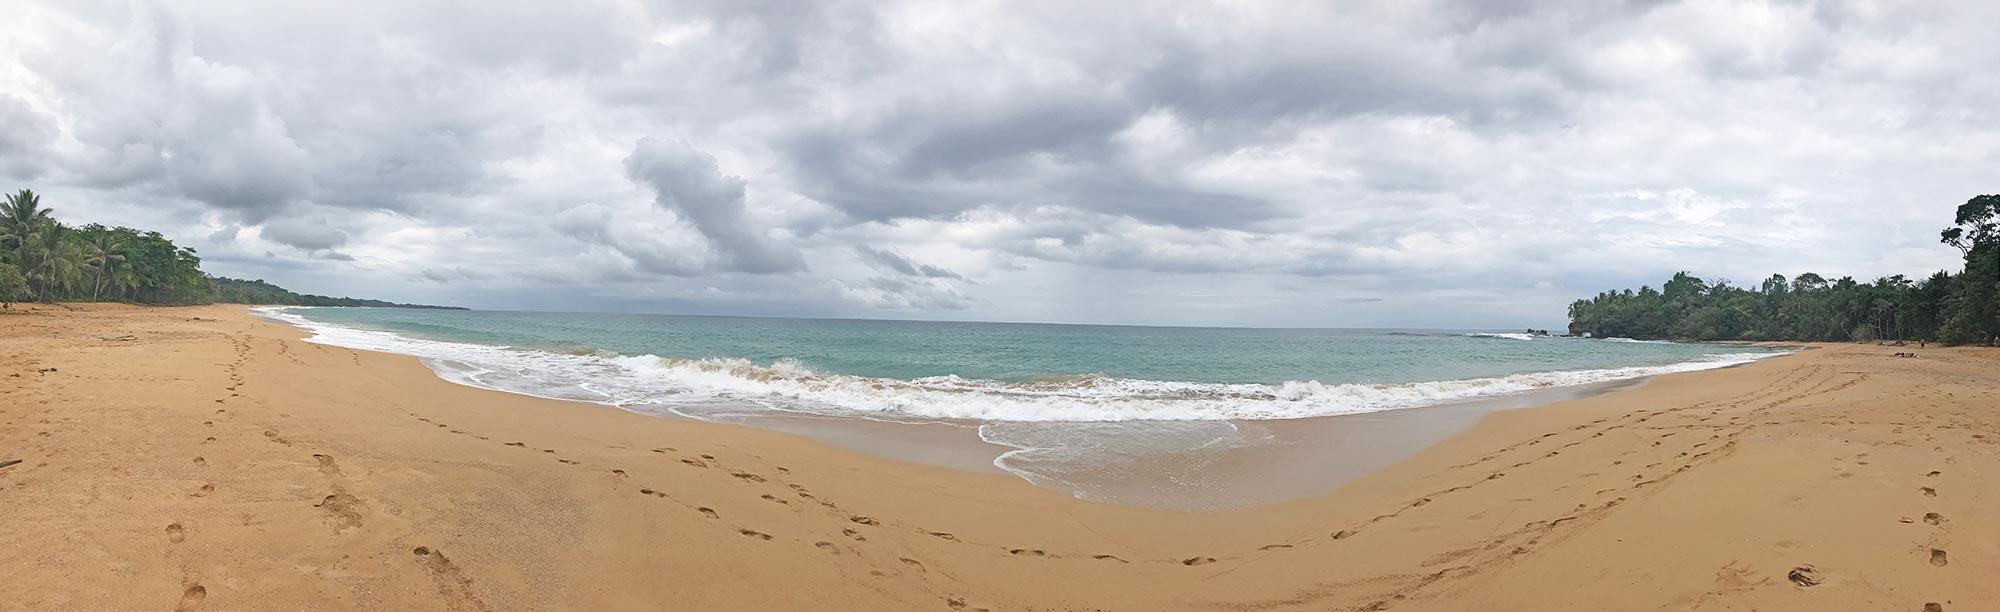 Playa Bluff Bocas del Toro, Panama